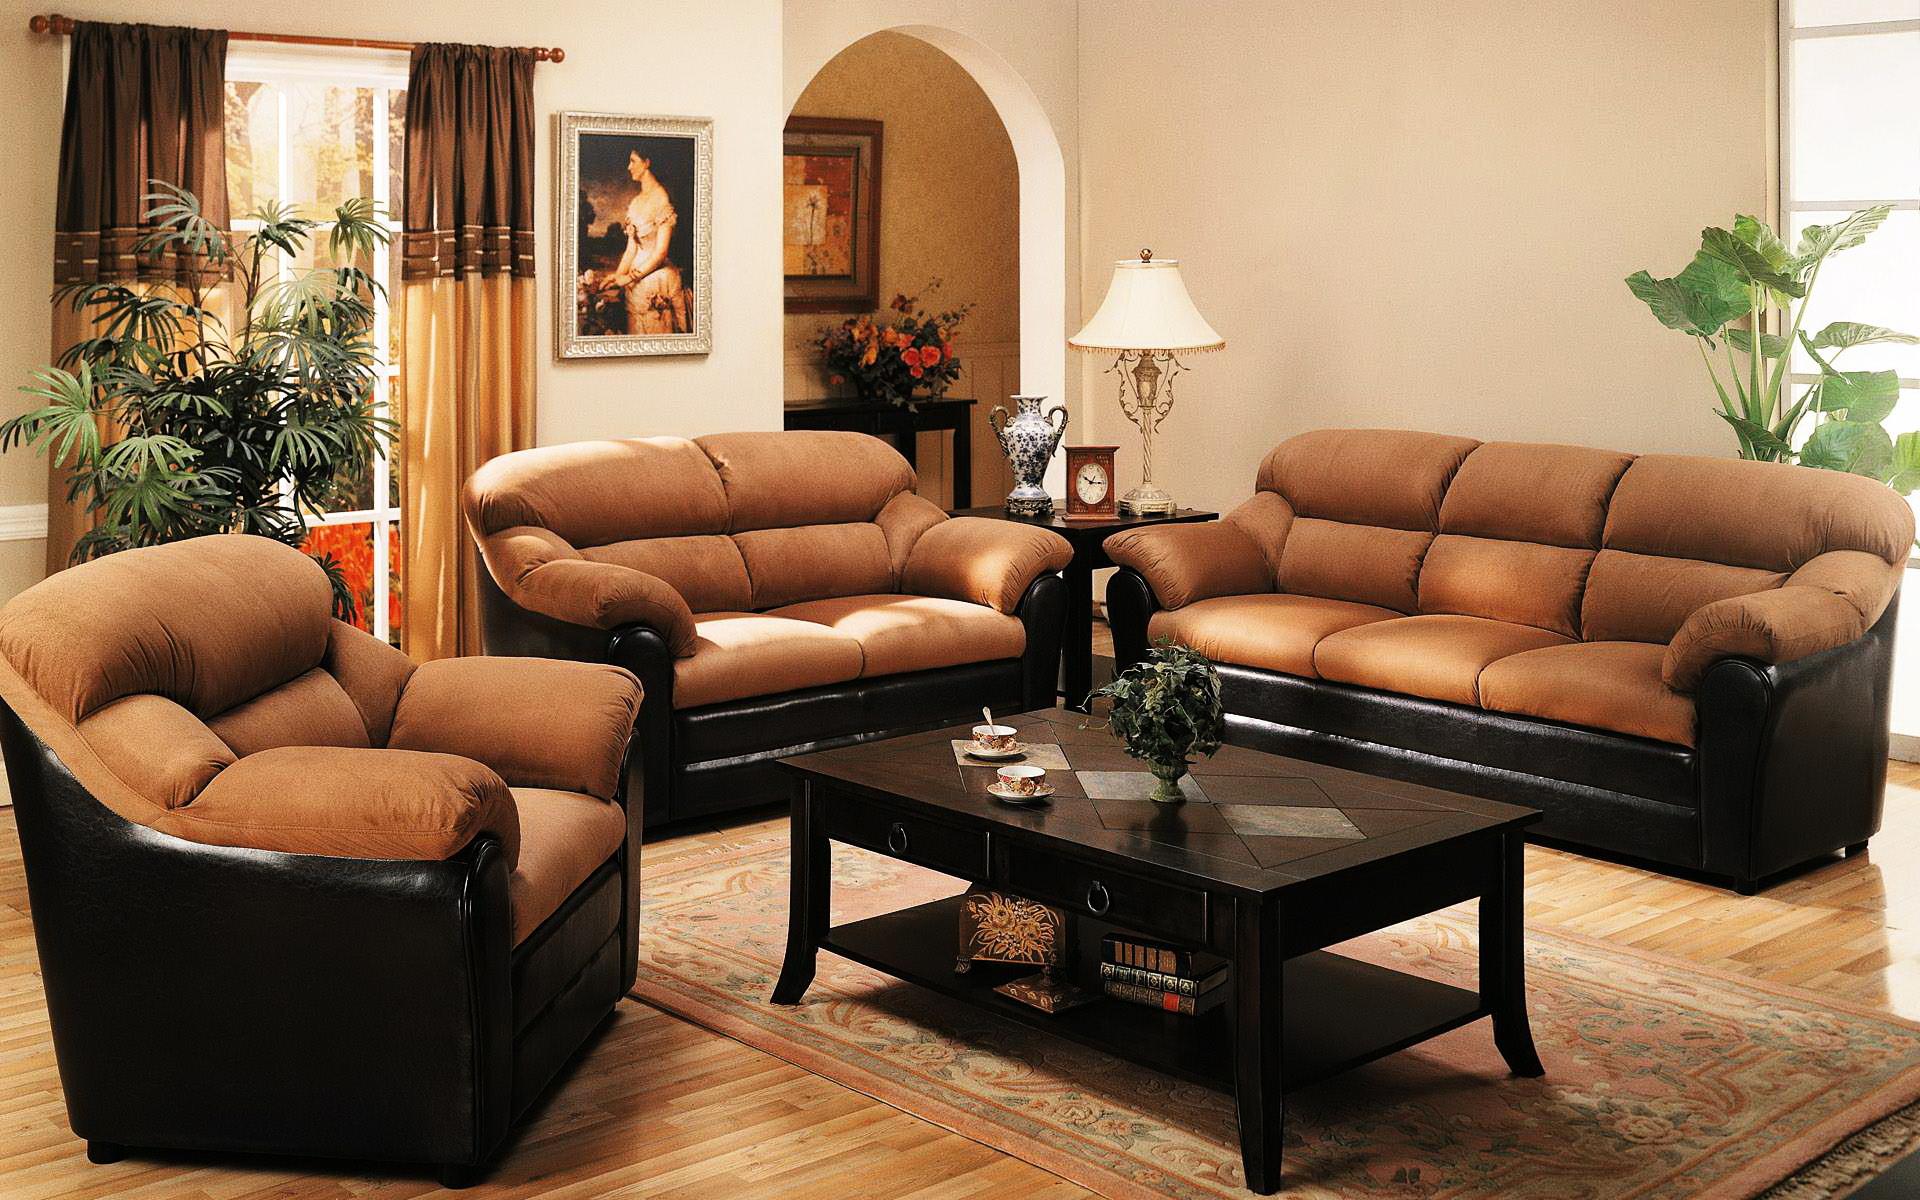 Home Decor Sofas Furniture And More